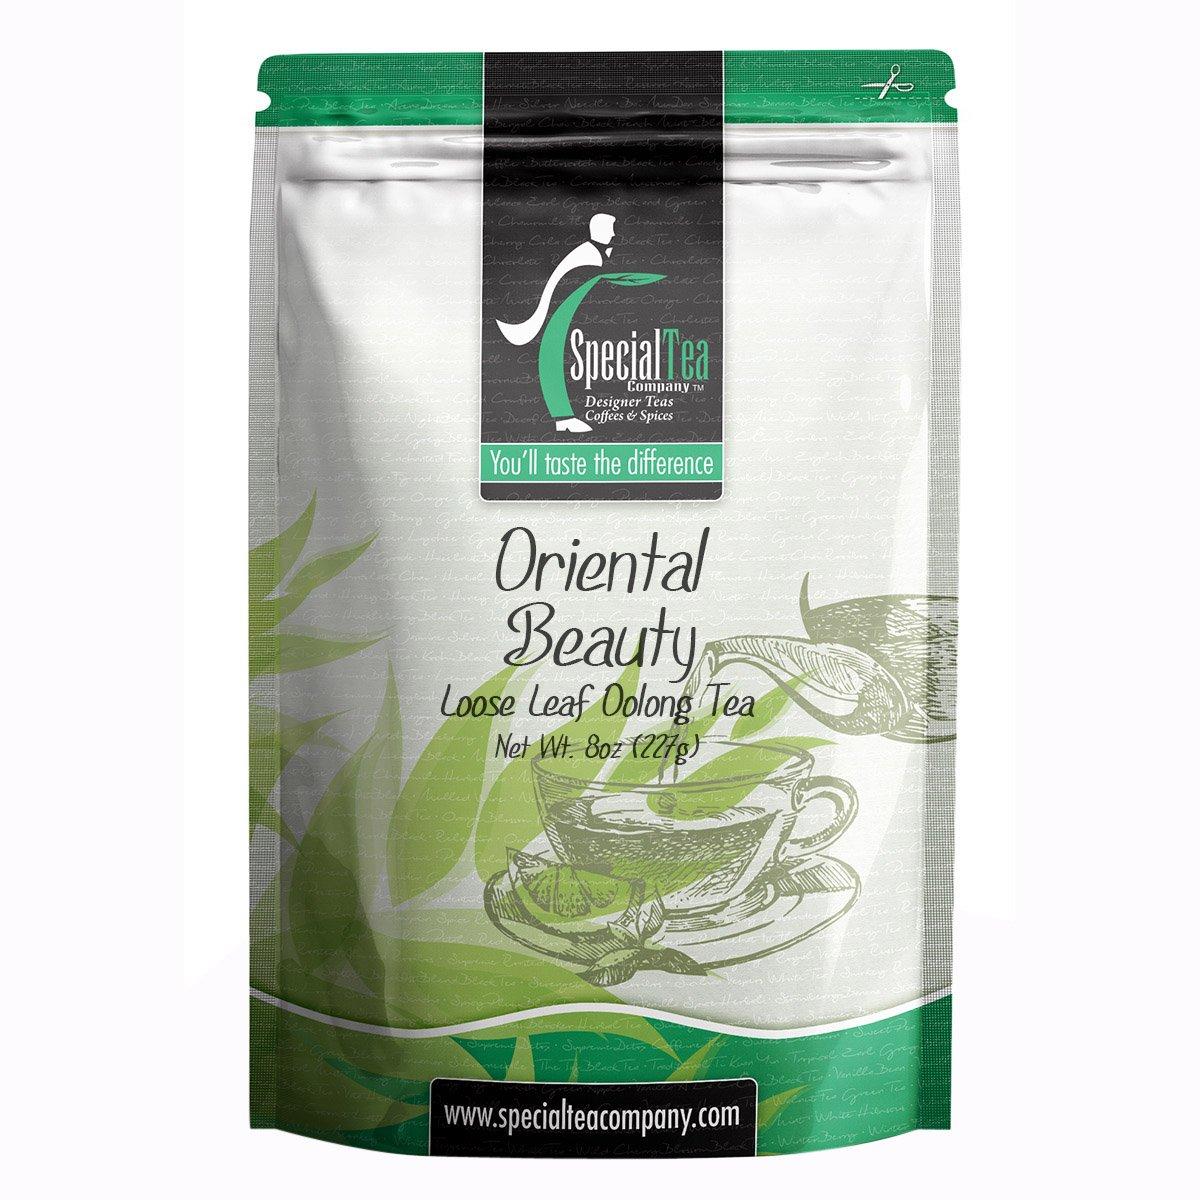 Special Tea Loose Leaf Tea, Oriental Beauty Oolong, 8 Ounce